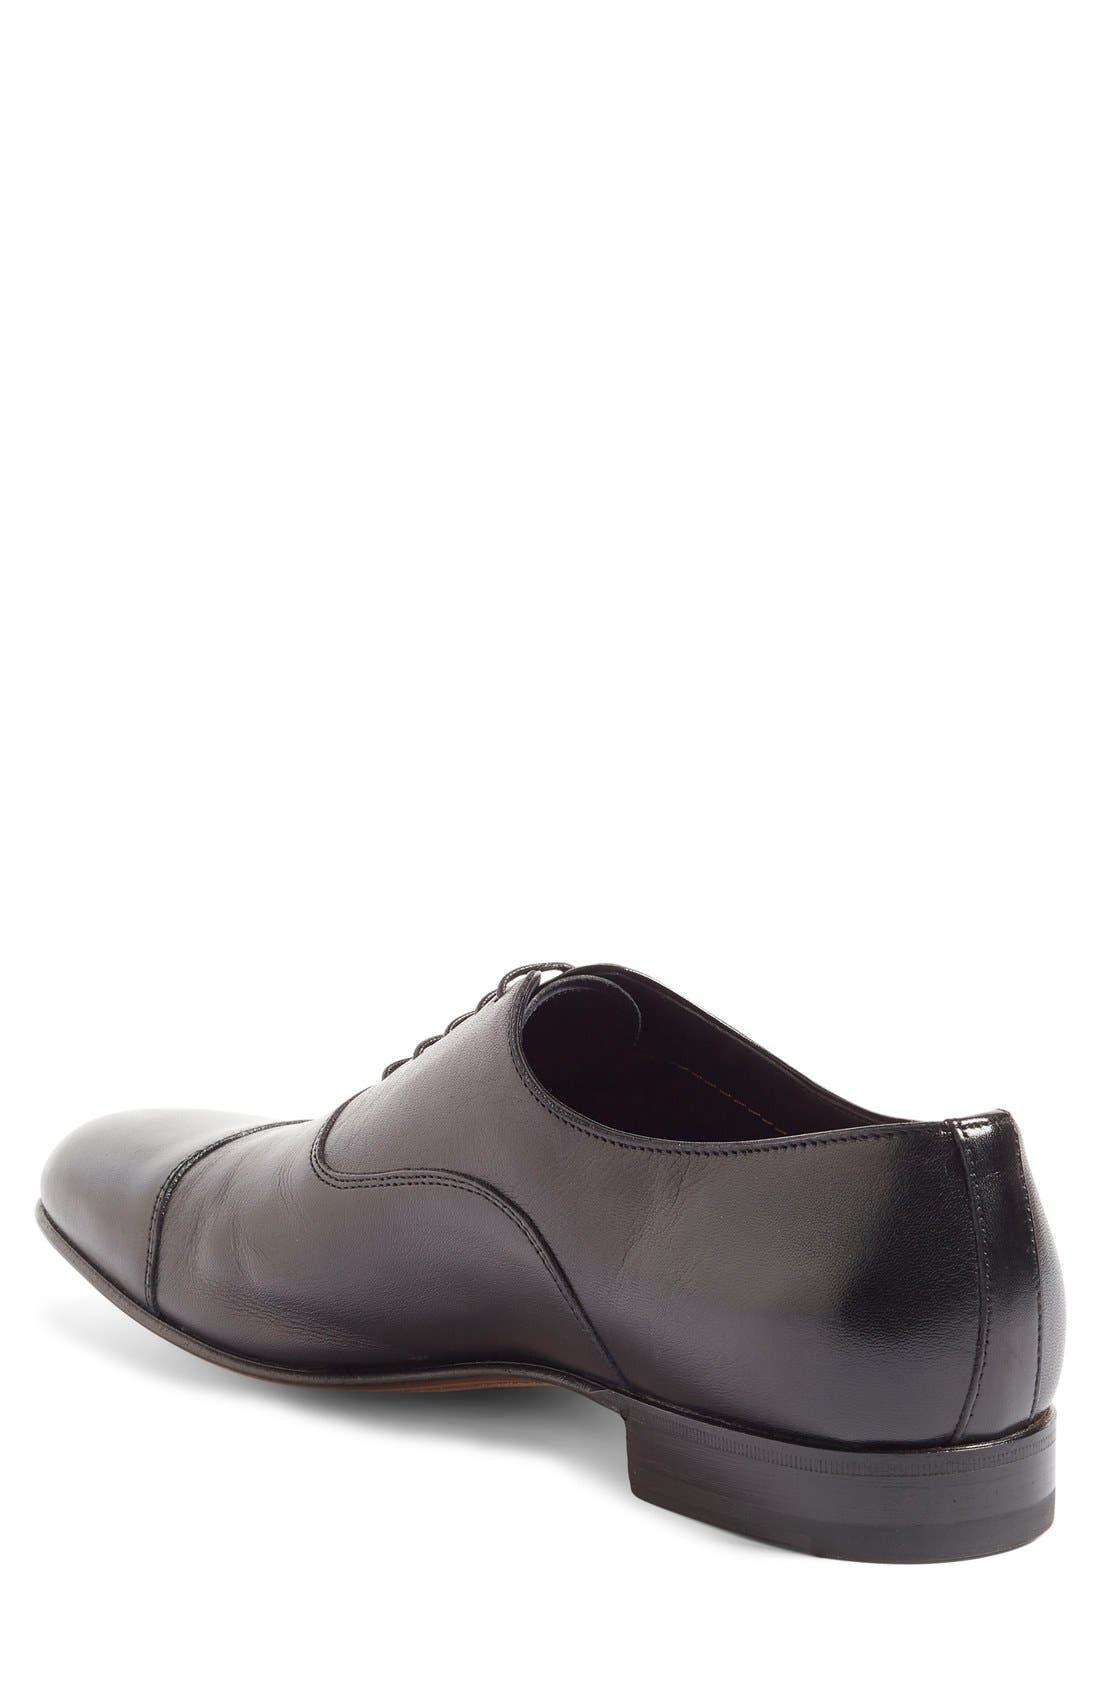 'Darian' Cap Toe Oxford,                             Alternate thumbnail 2, color,                             Black Leather